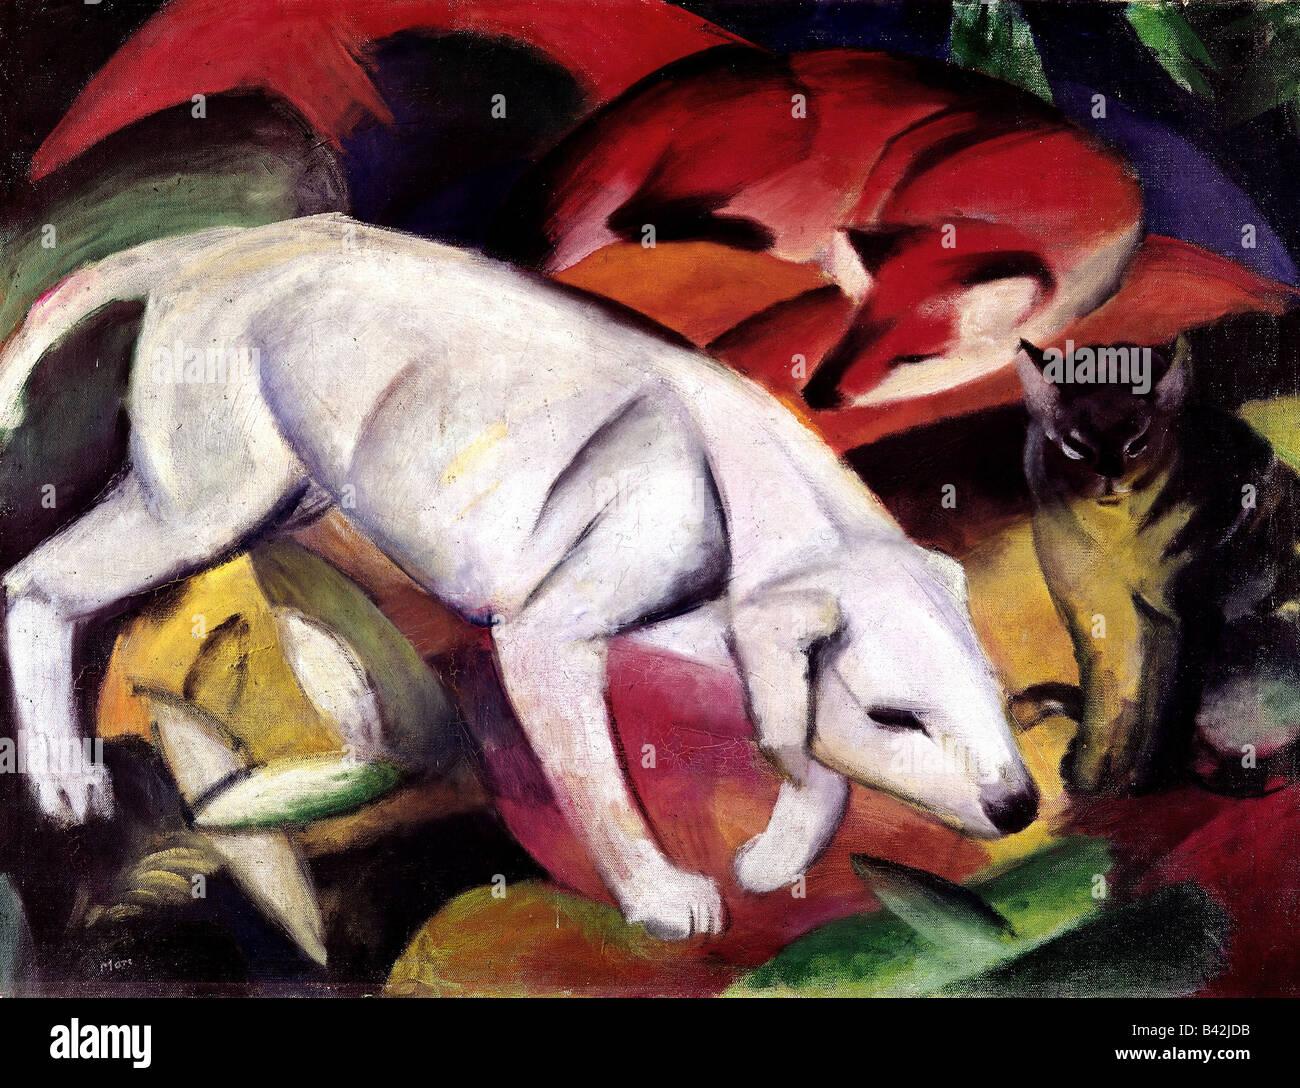 Belle arti, Marc Franz, 8.2.1880 - 4.3.1916, pittura, 'Dog, Fox e cat', (Hund, Fuchs und Katze), 1912, olio su tela, Foto Stock